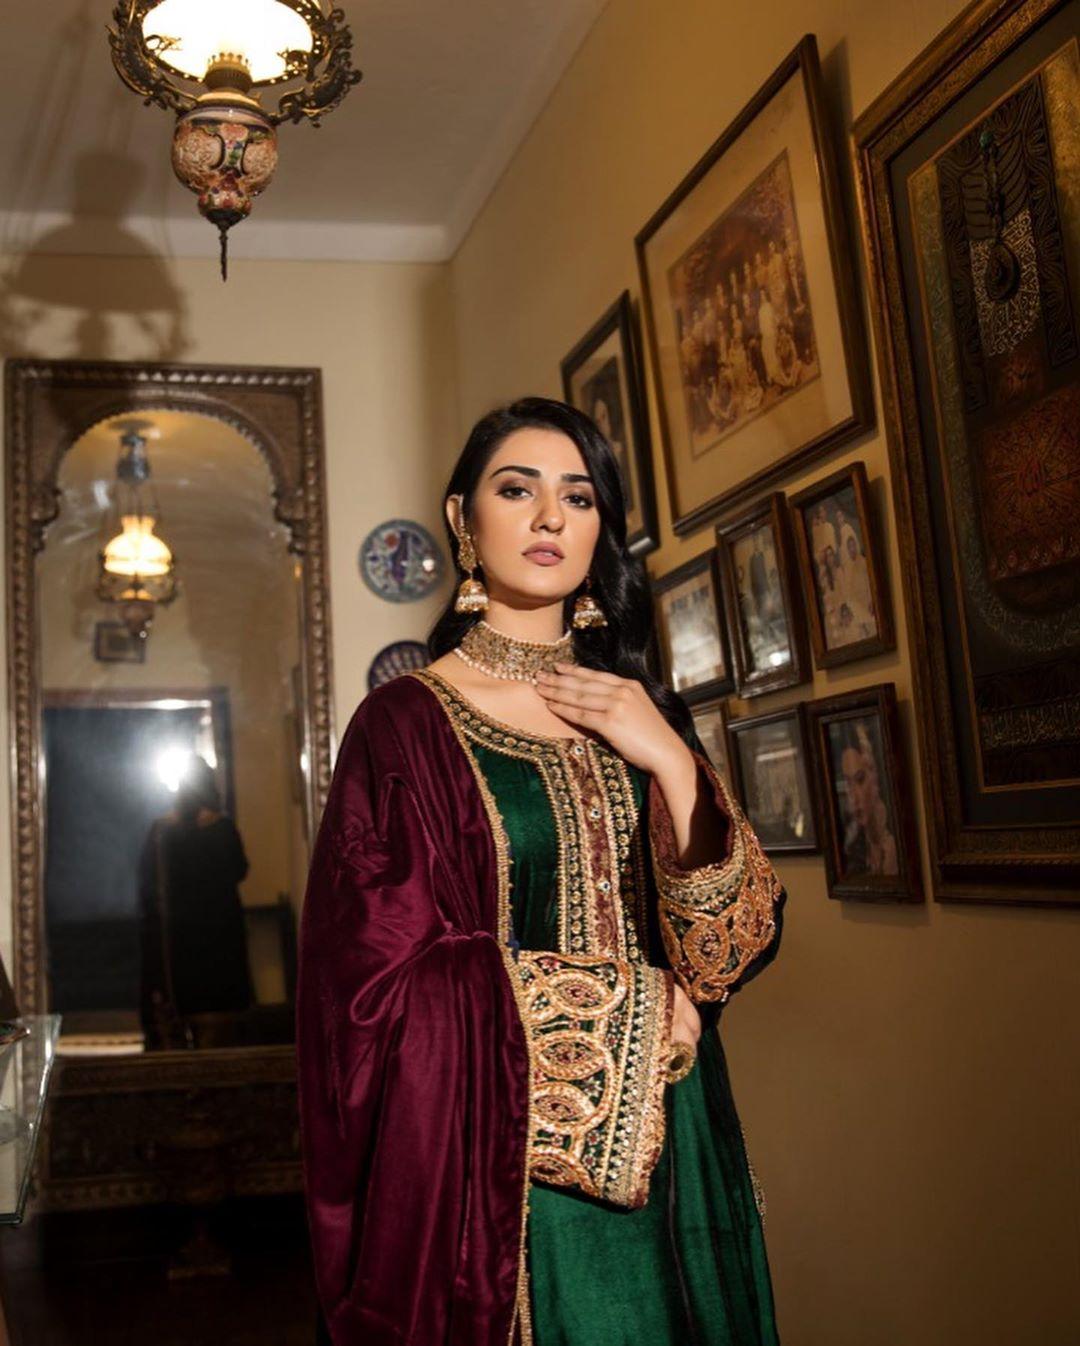 Sarah Khan Stunning Looks from Latest Photoshoot